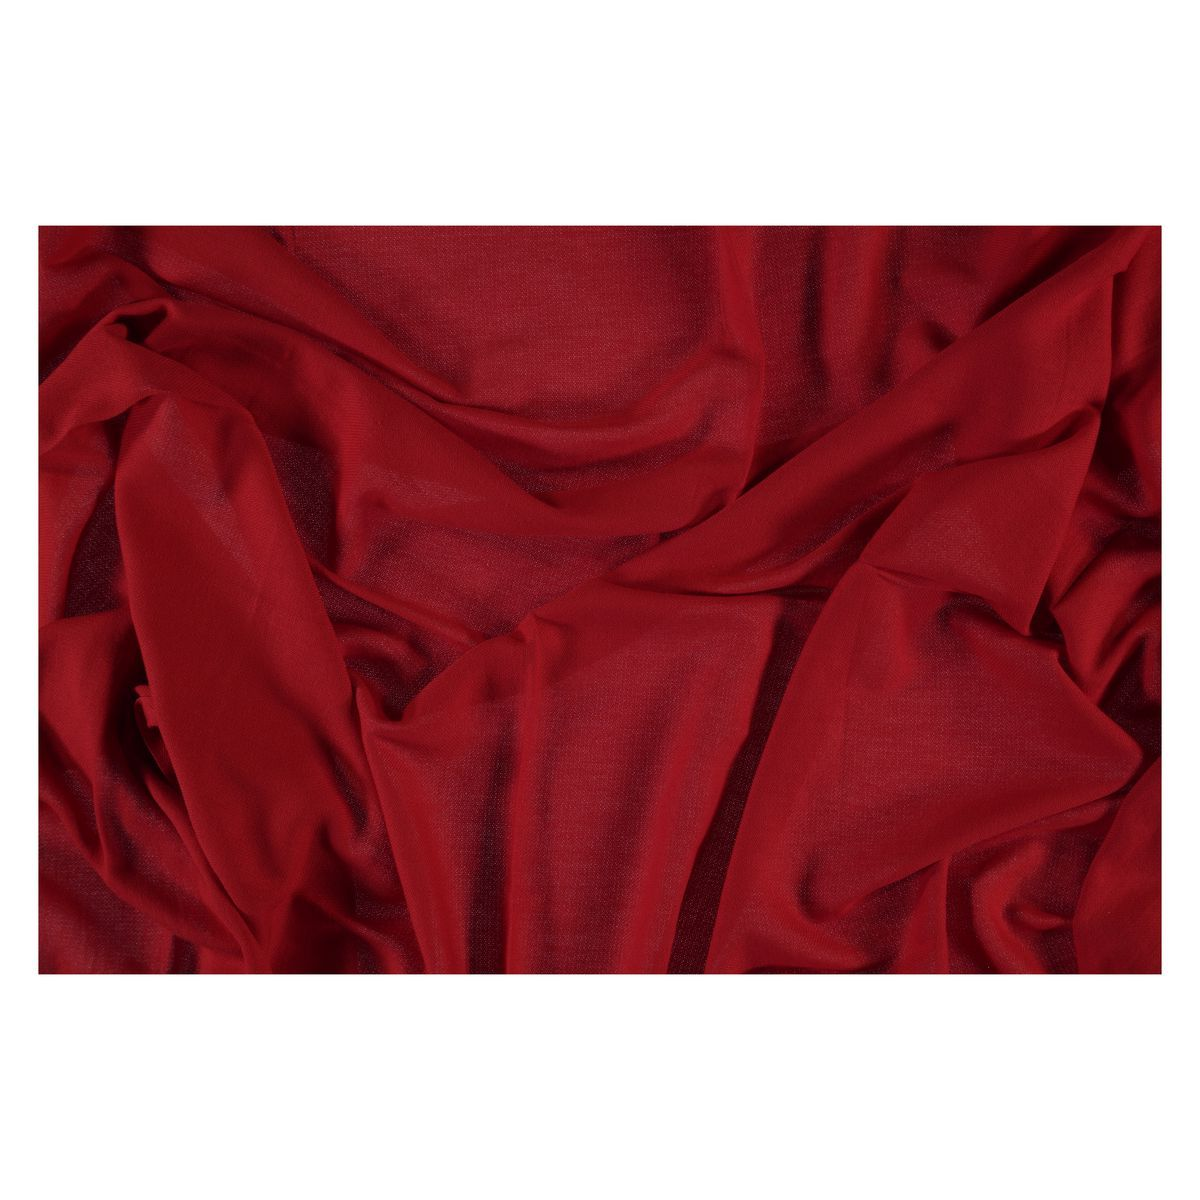 Peştemal Kevser - Kırmızı